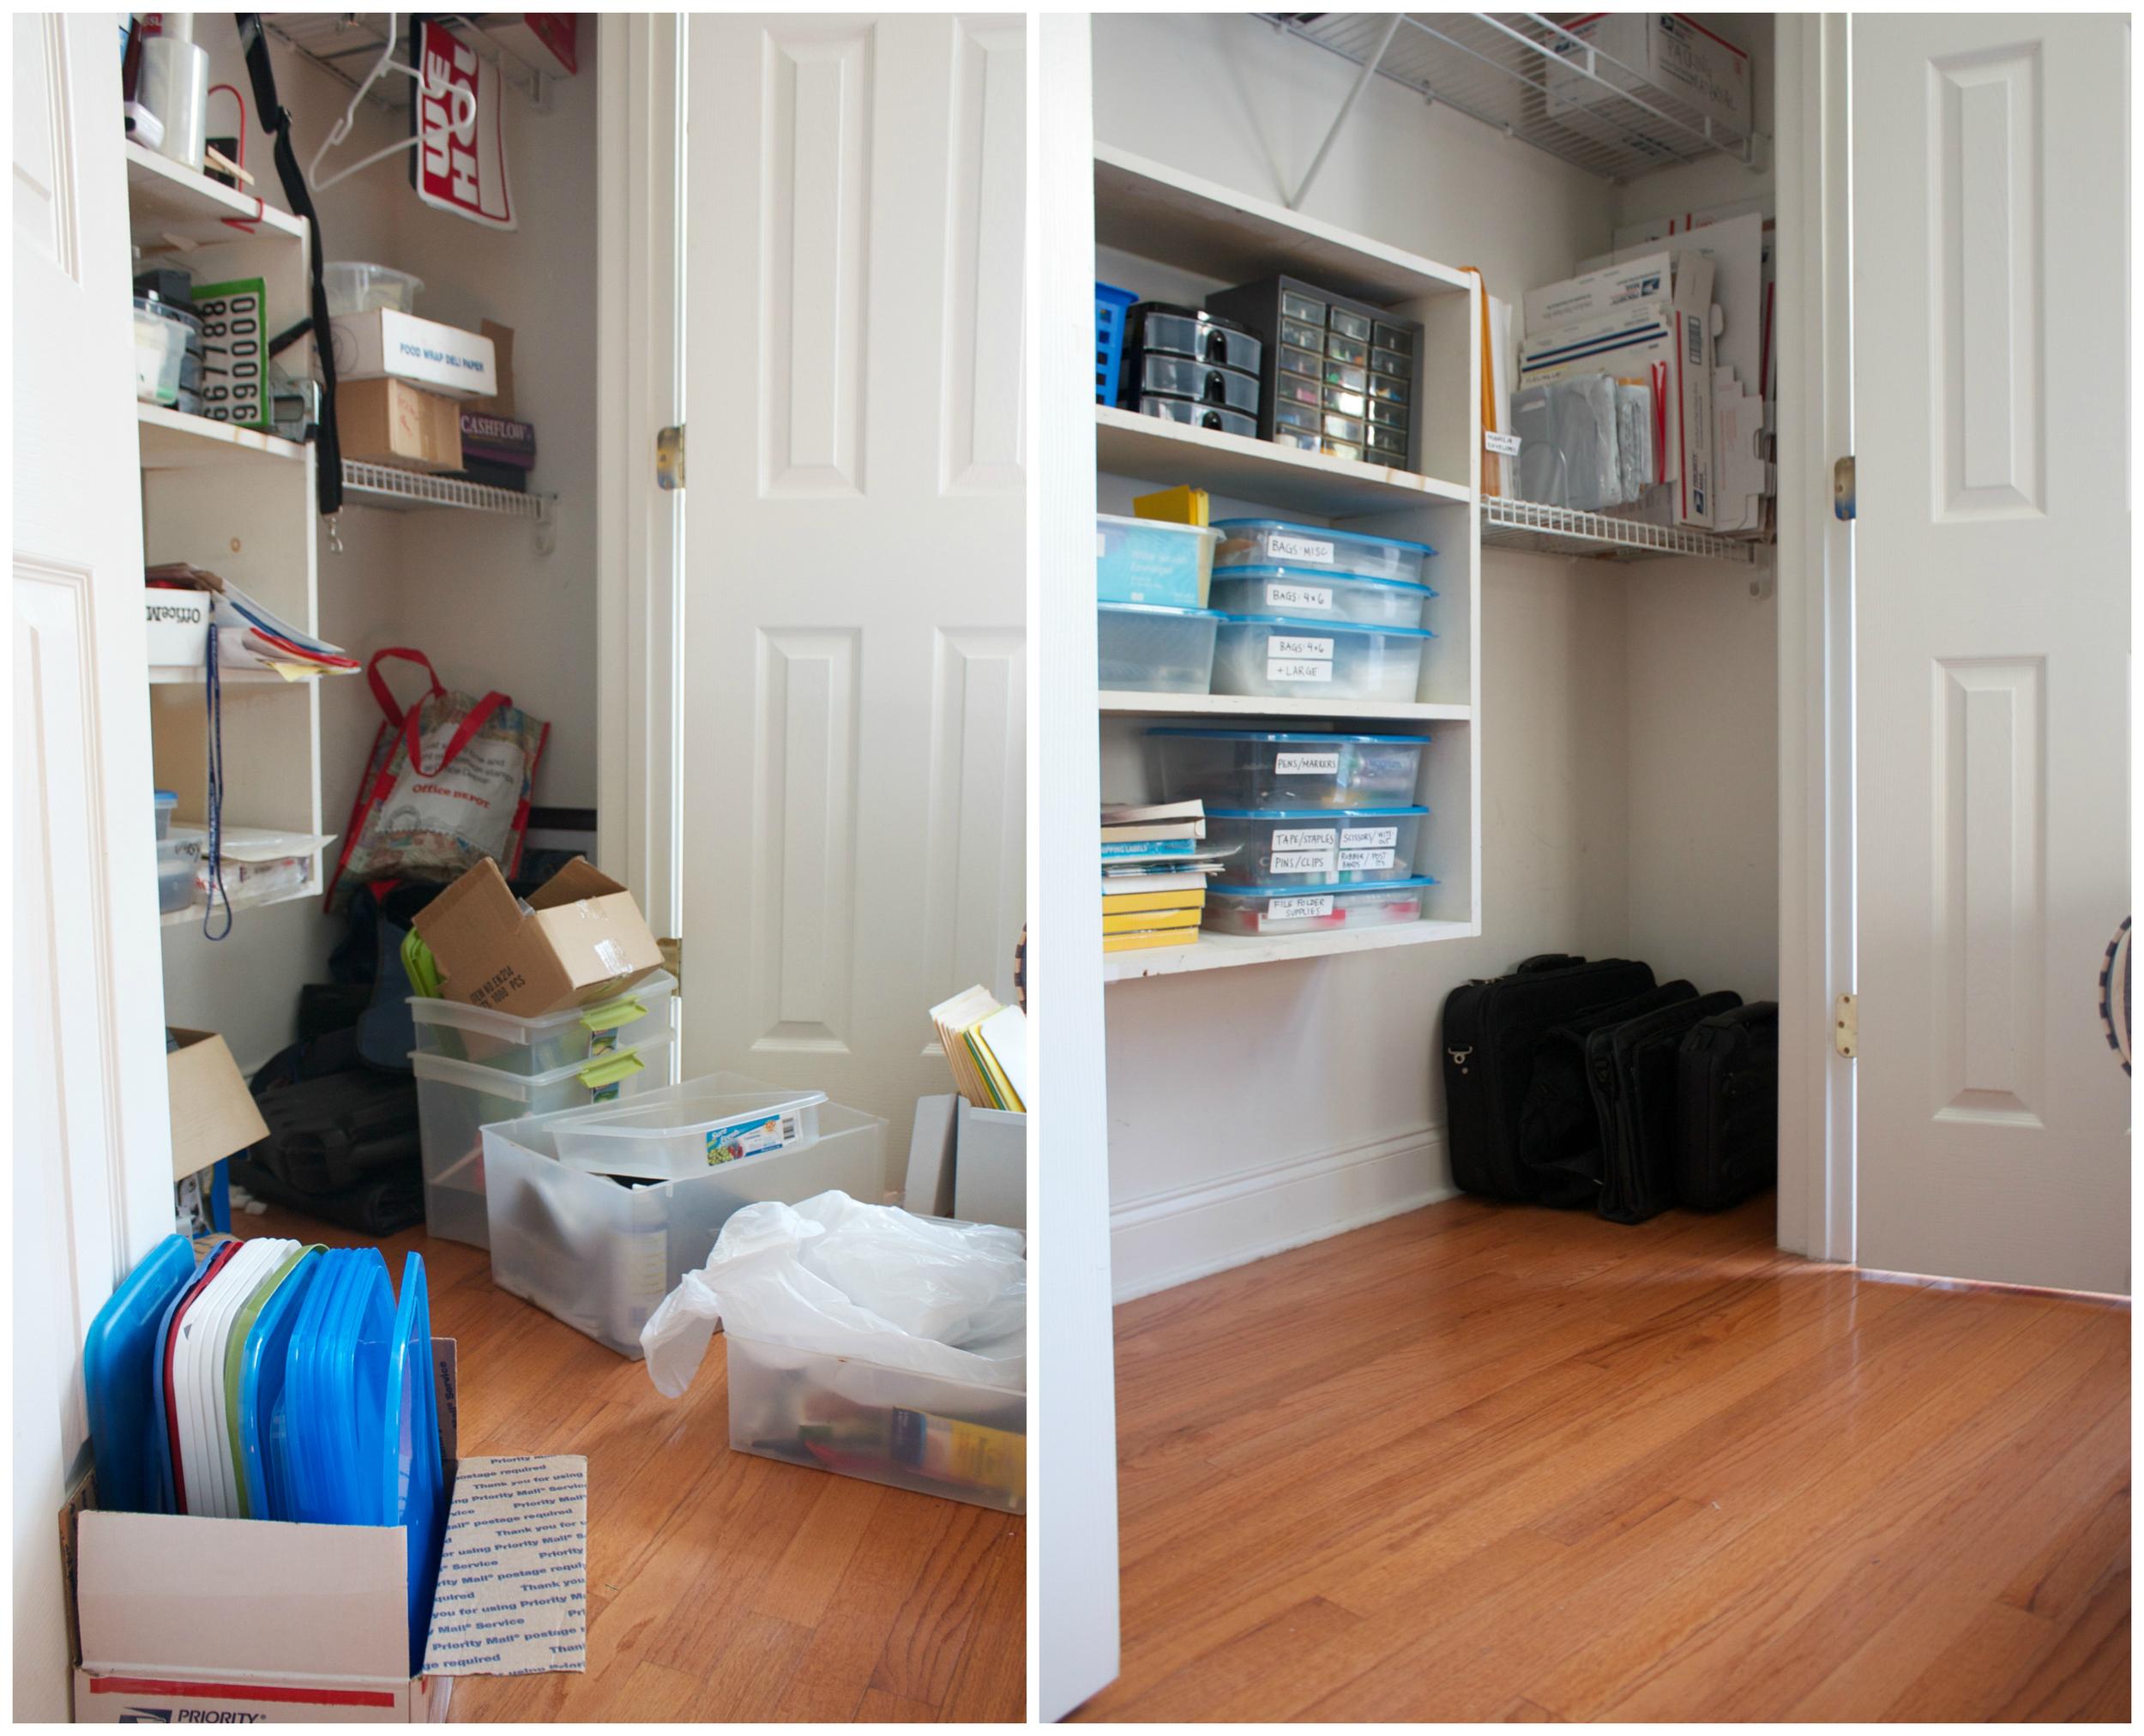 3 closet full v3 before after.jpg